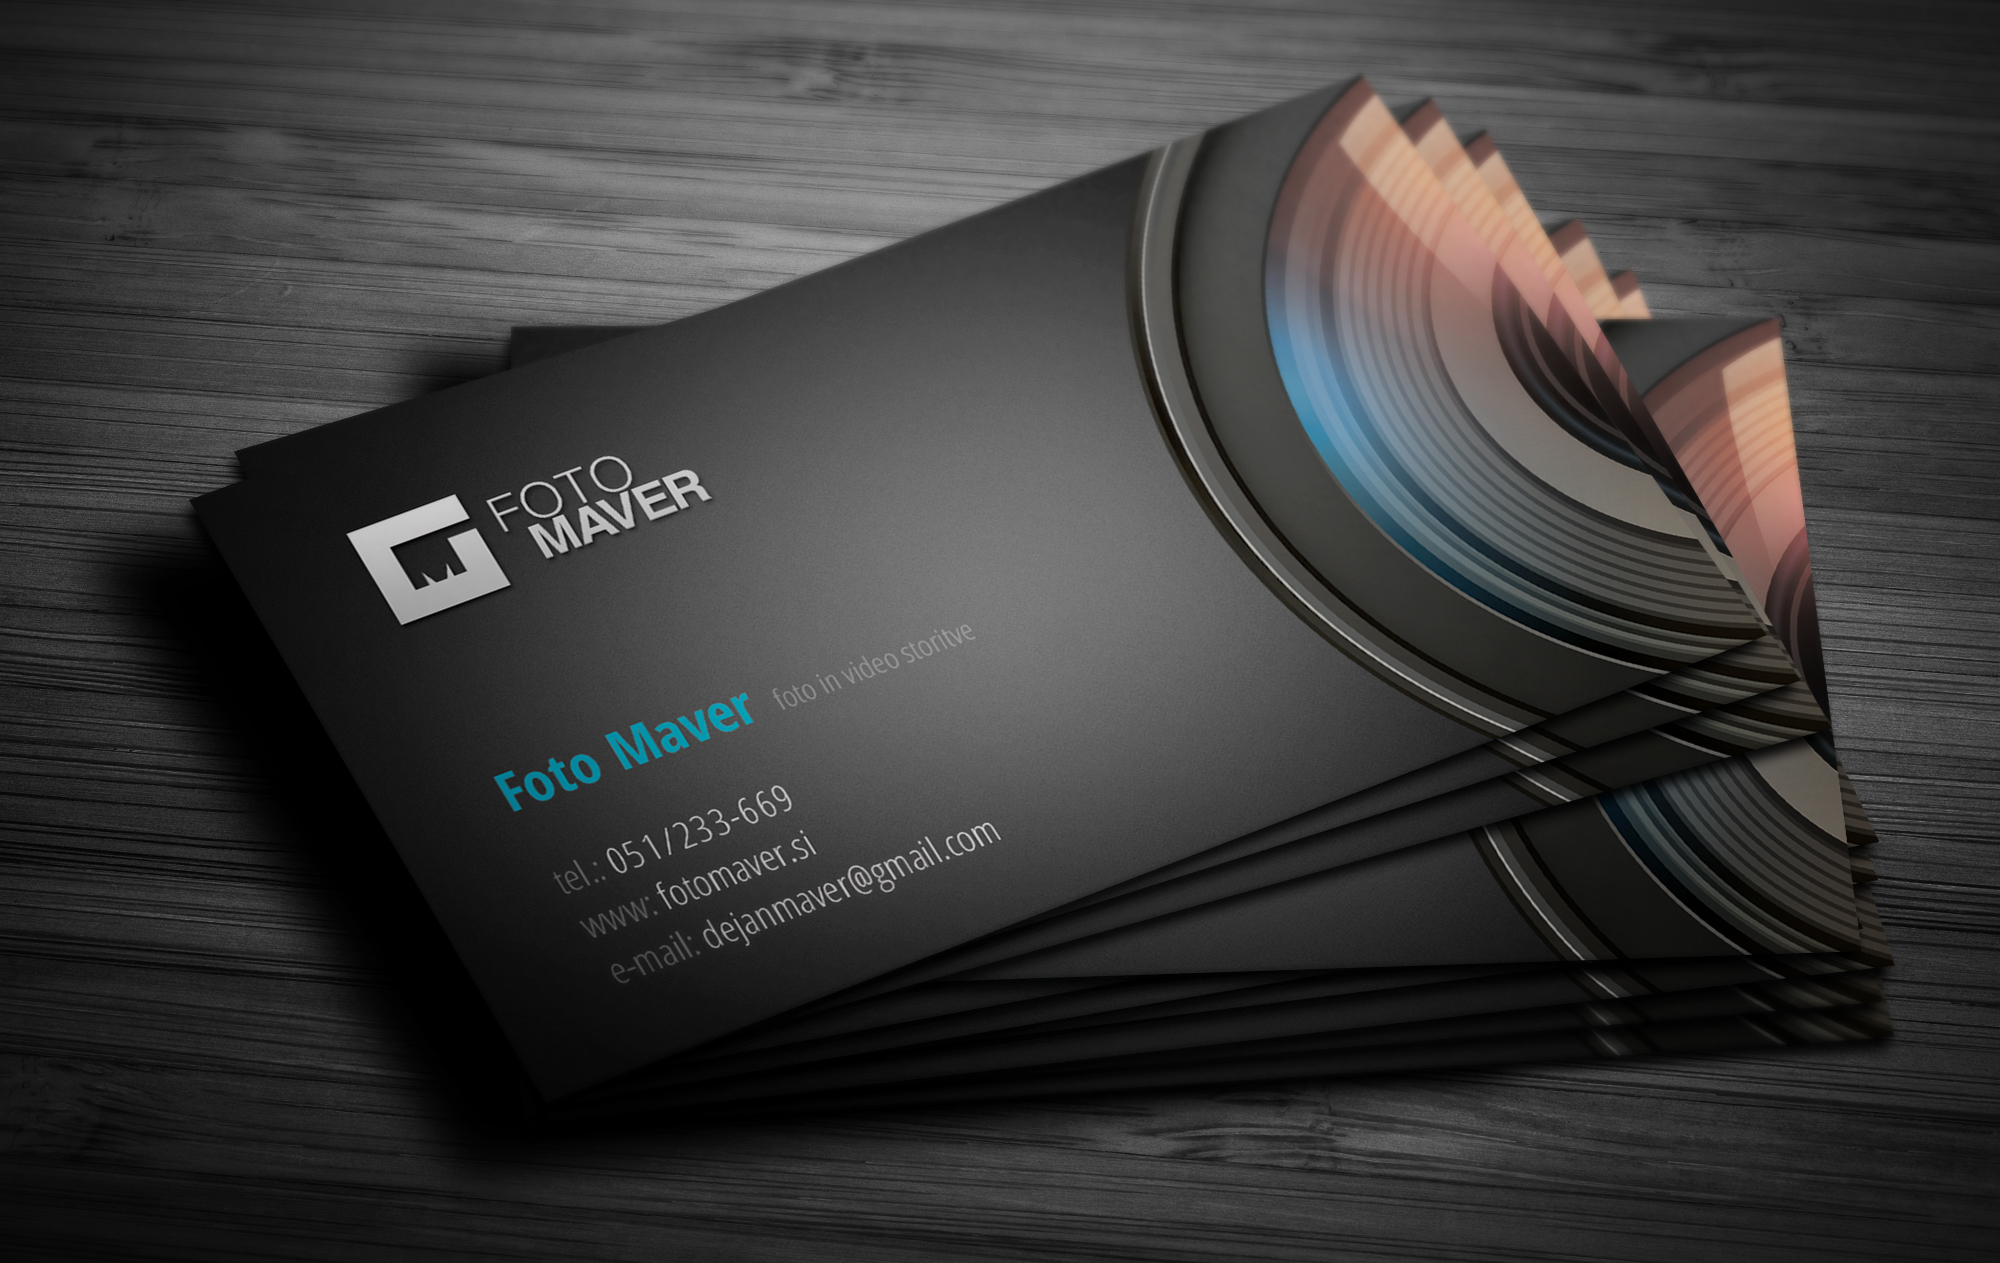 Business Card - Photo Studio by Jodlar on DeviantArt